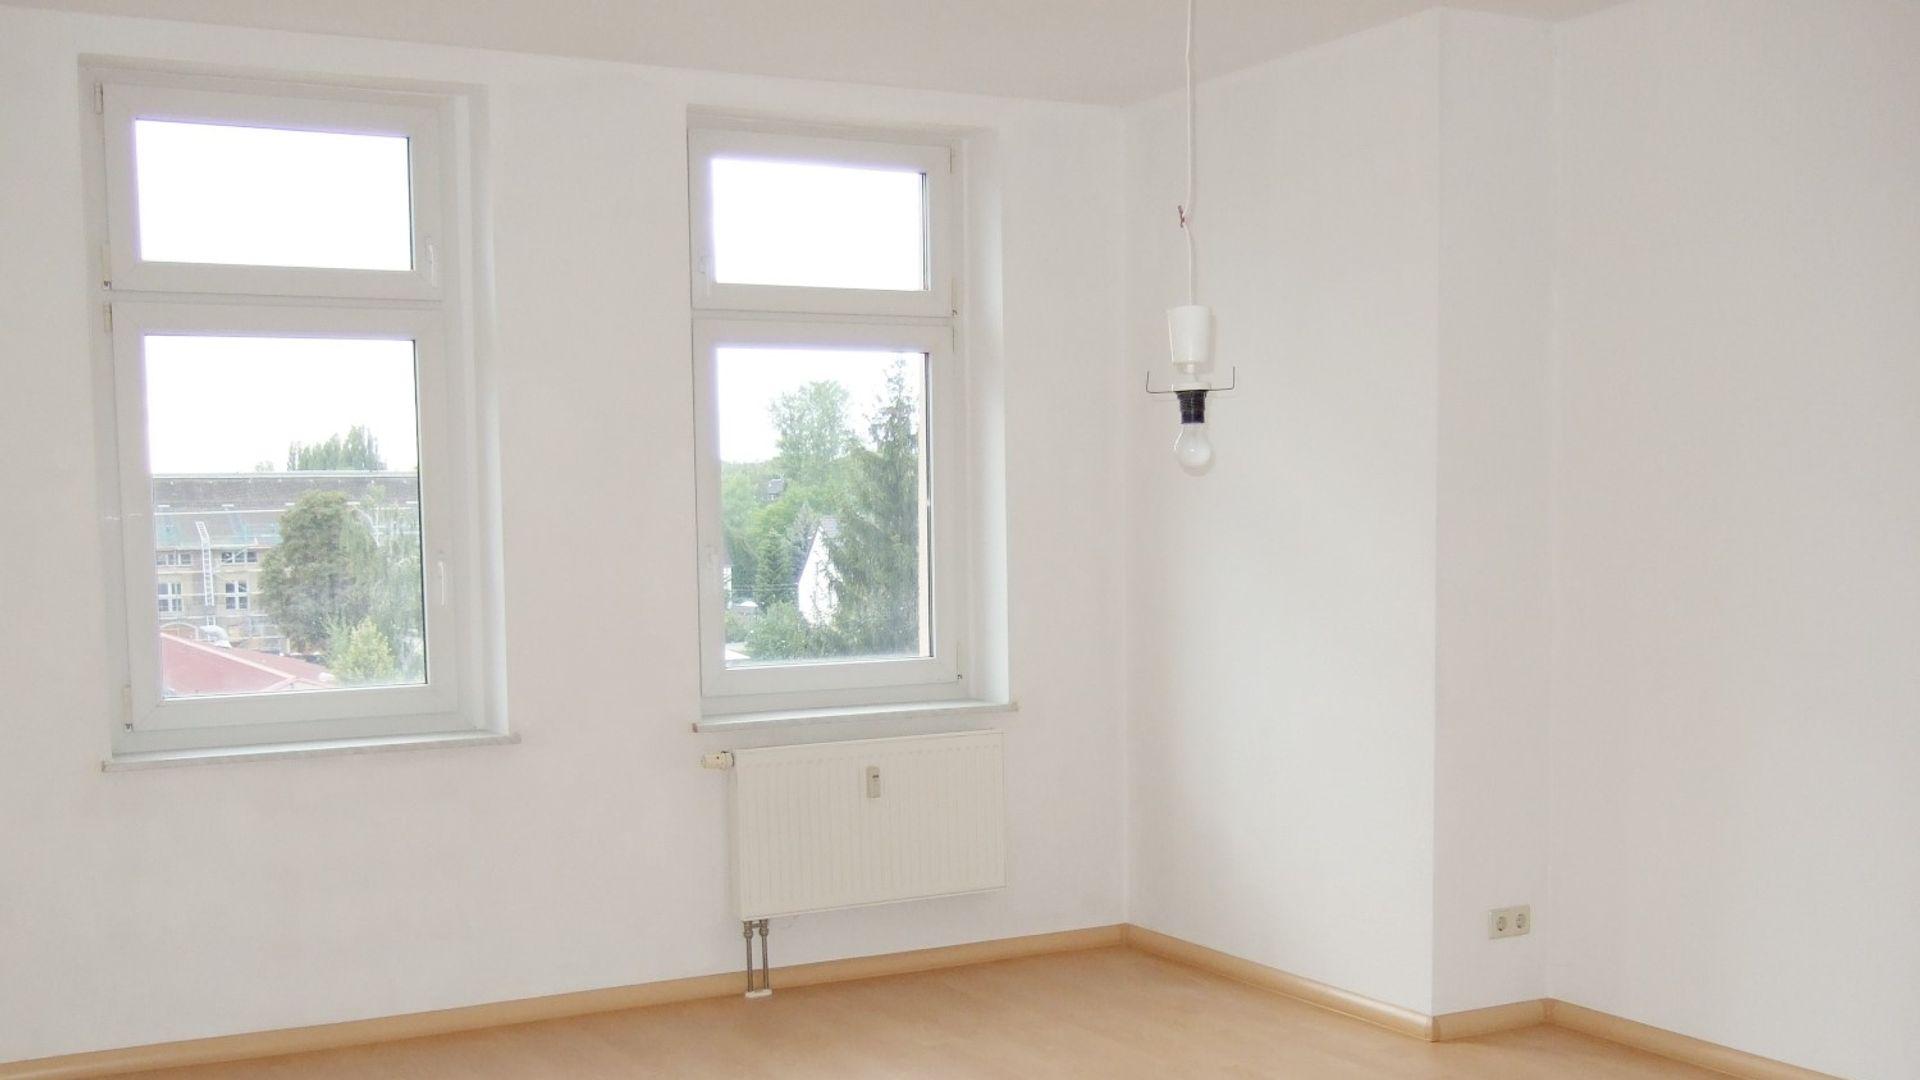 1 Bed Apartment At Chemnitz Kassberg Saxony De For Rent 4617711 Rentberry